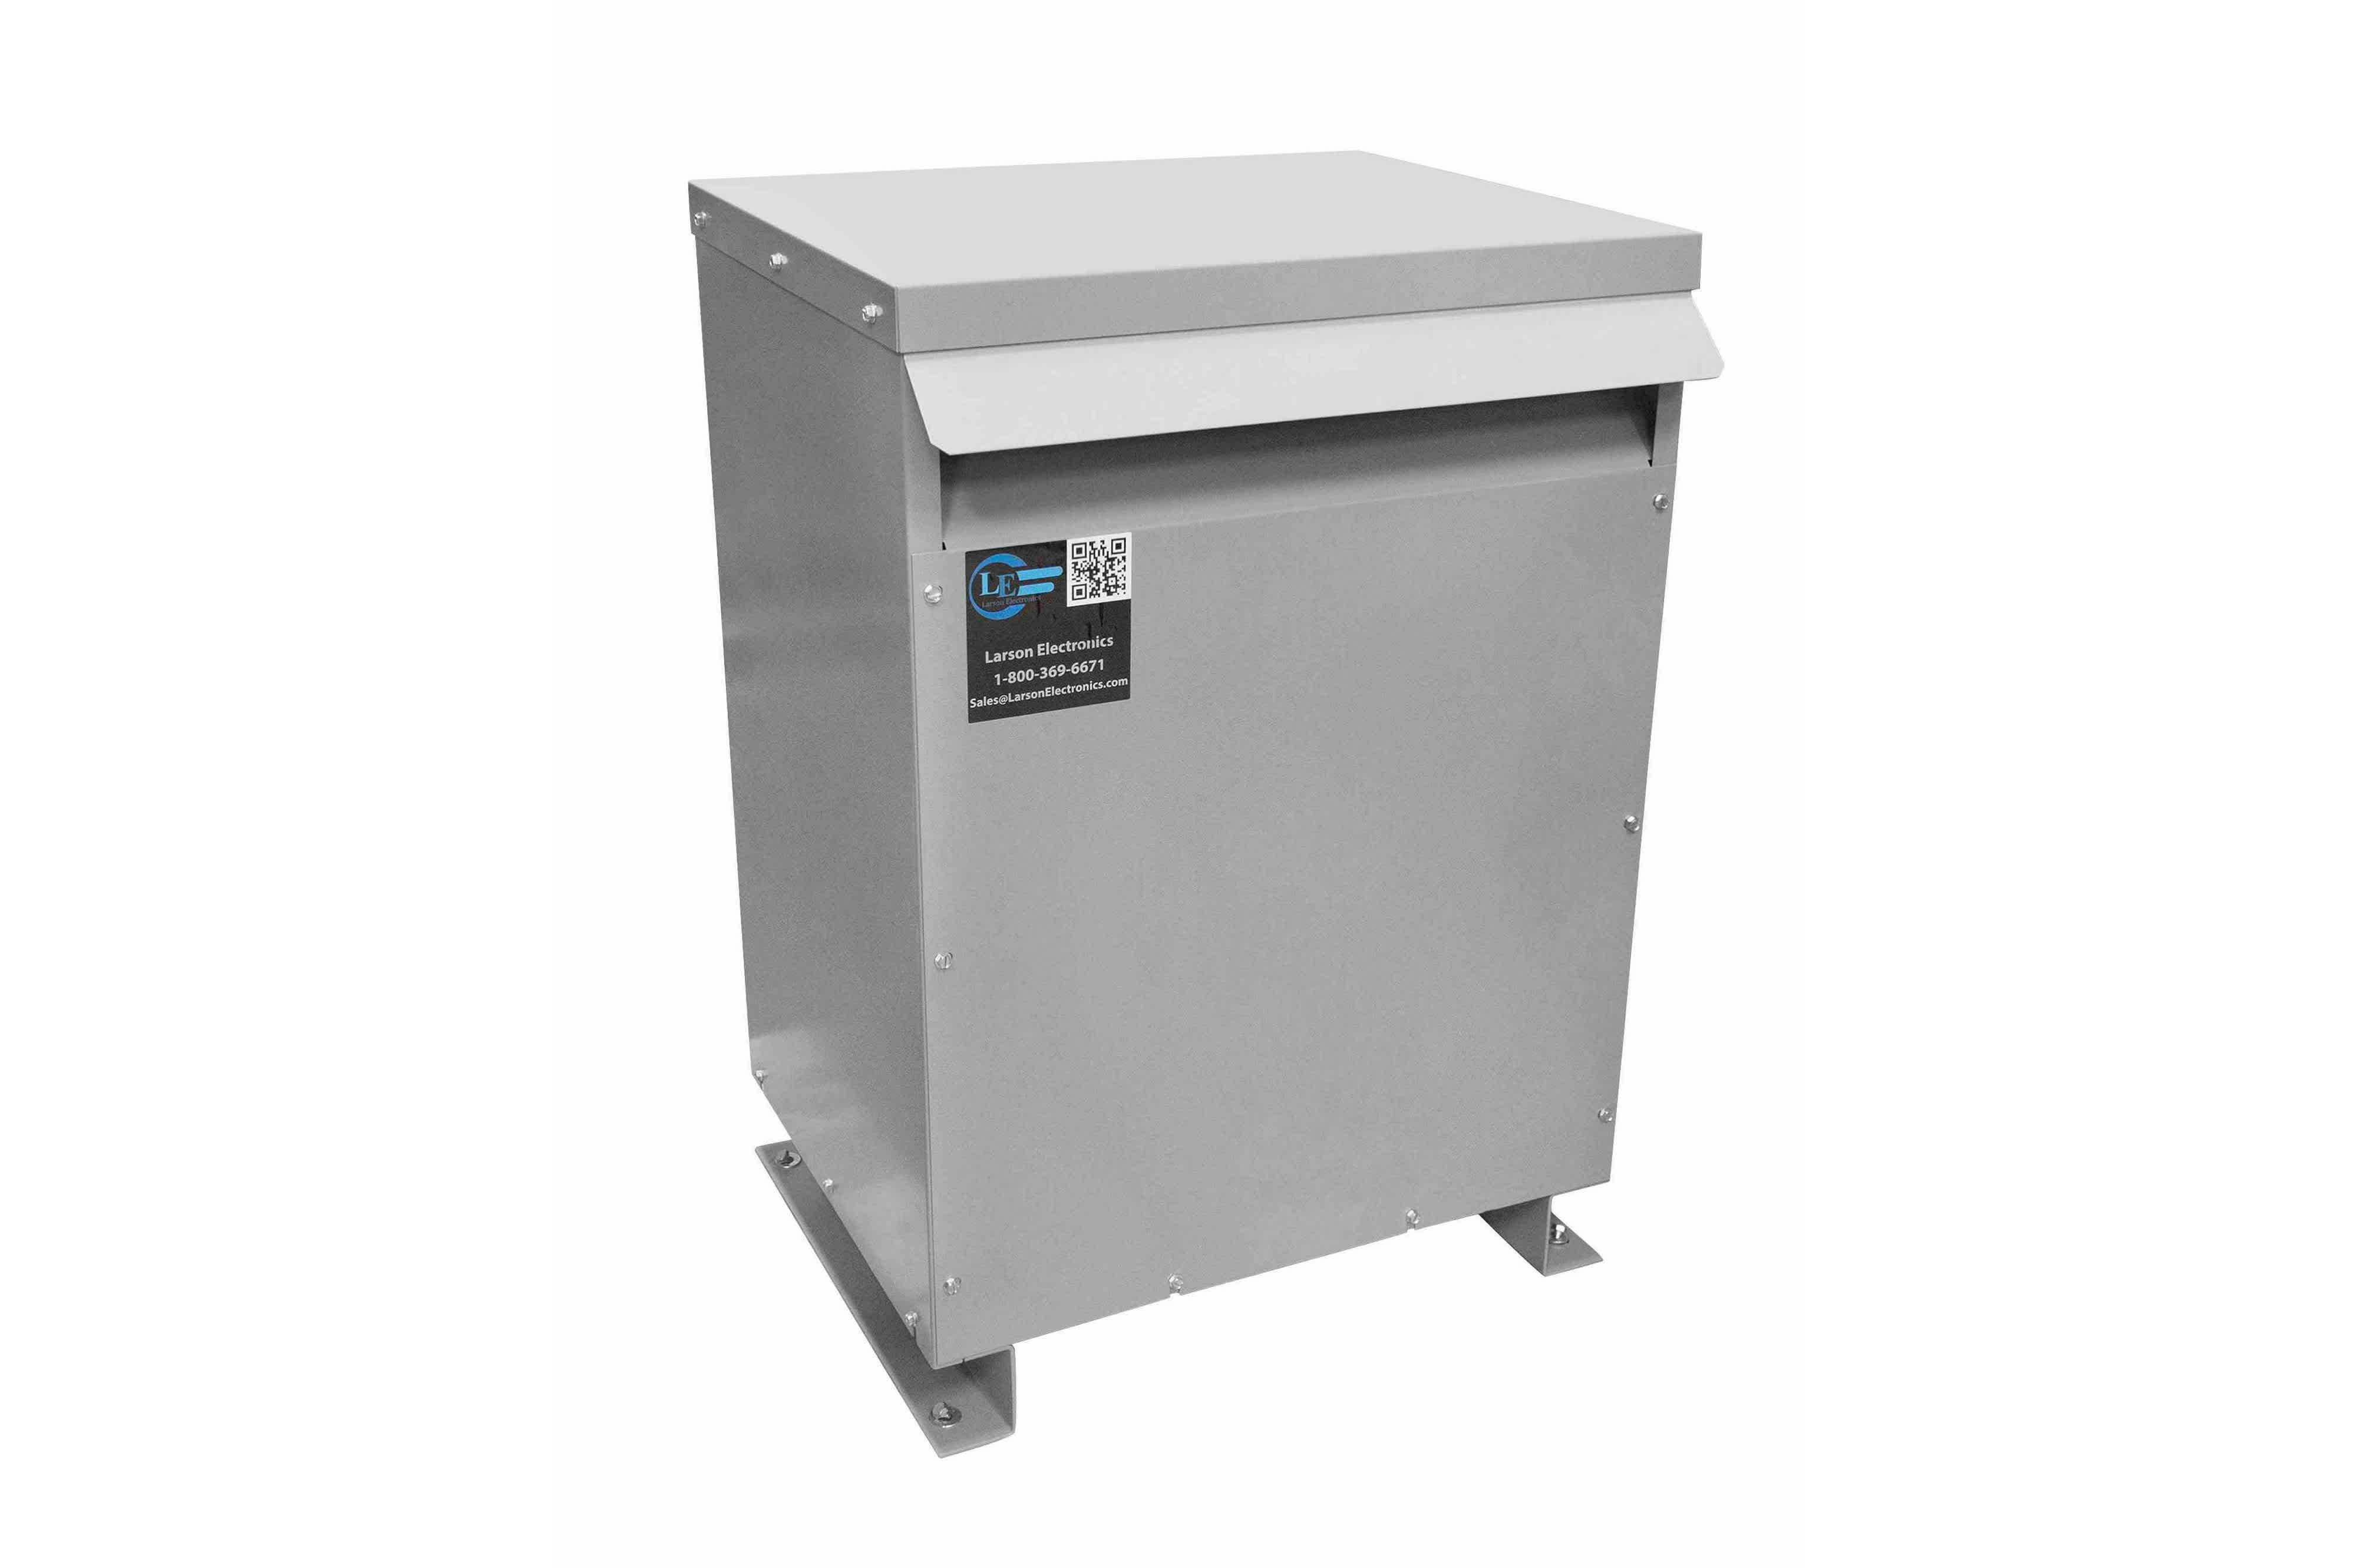 600 kVA 3PH Isolation Transformer, 480V Wye Primary, 415V Delta Secondary, N3R, Ventilated, 60 Hz